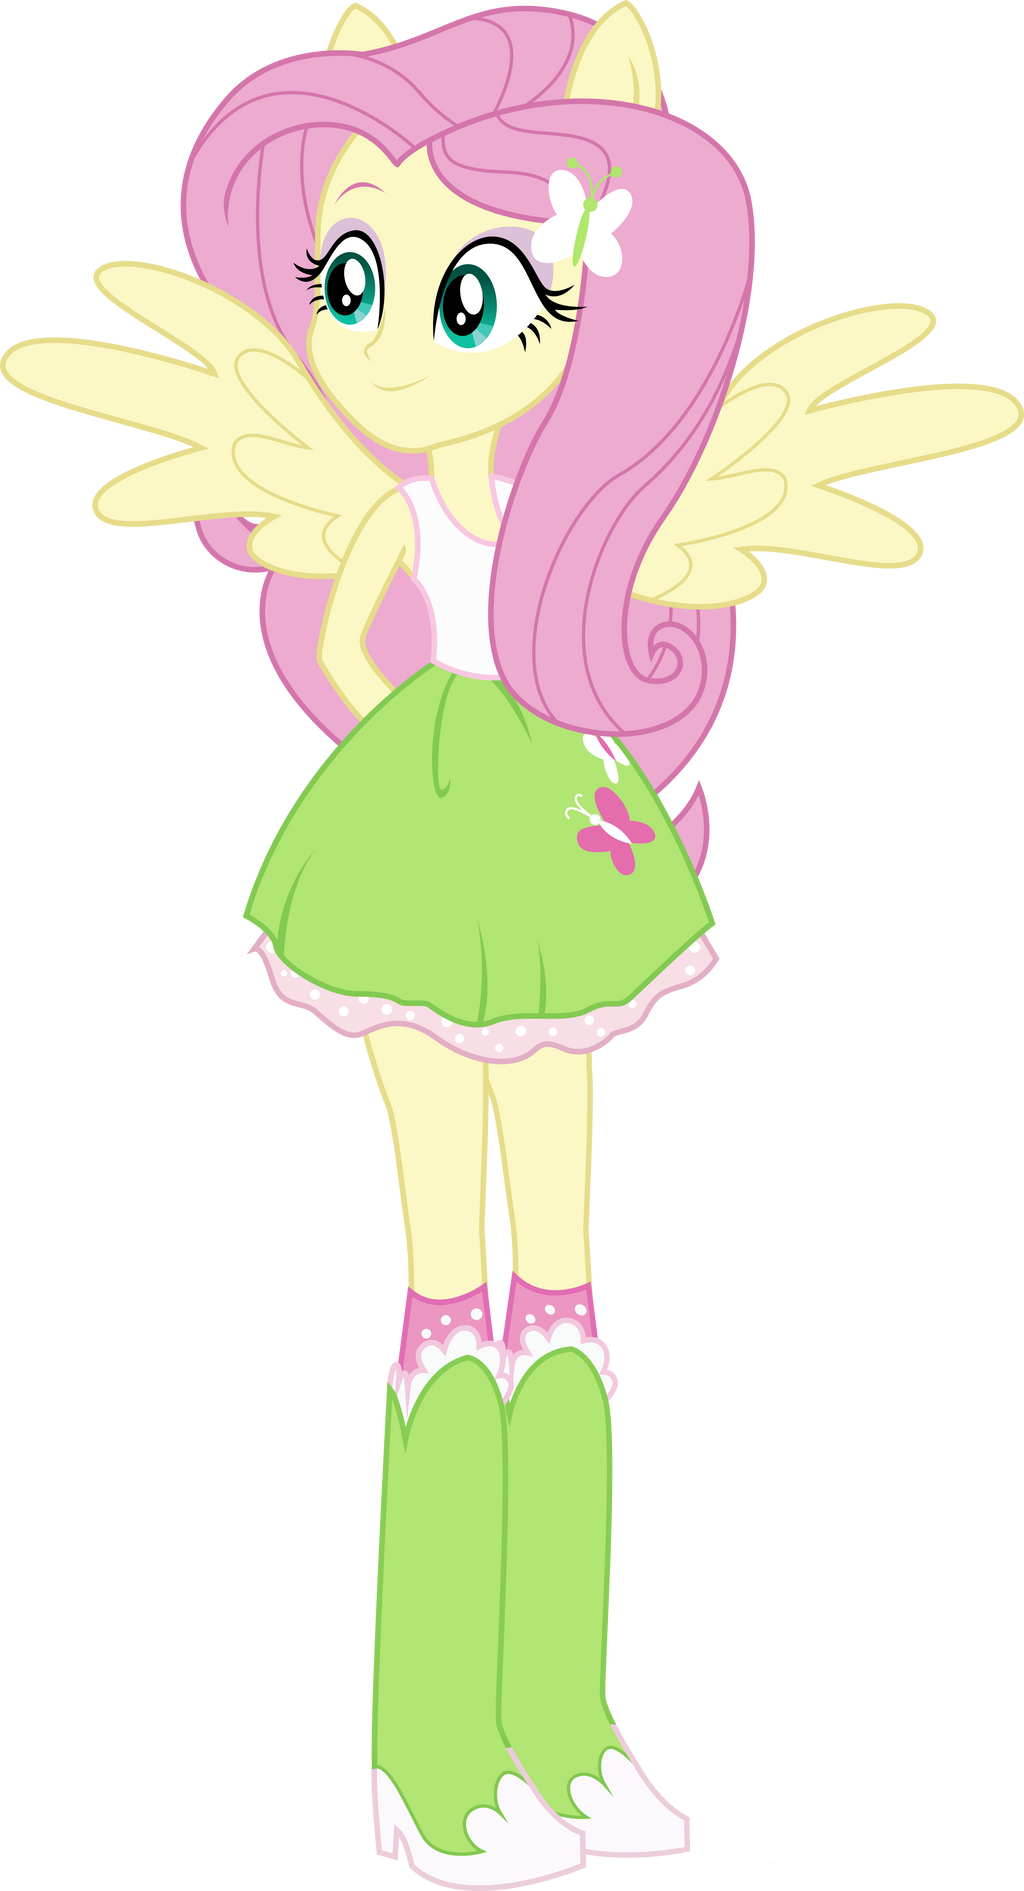 Image result for fluttershy equestria girl